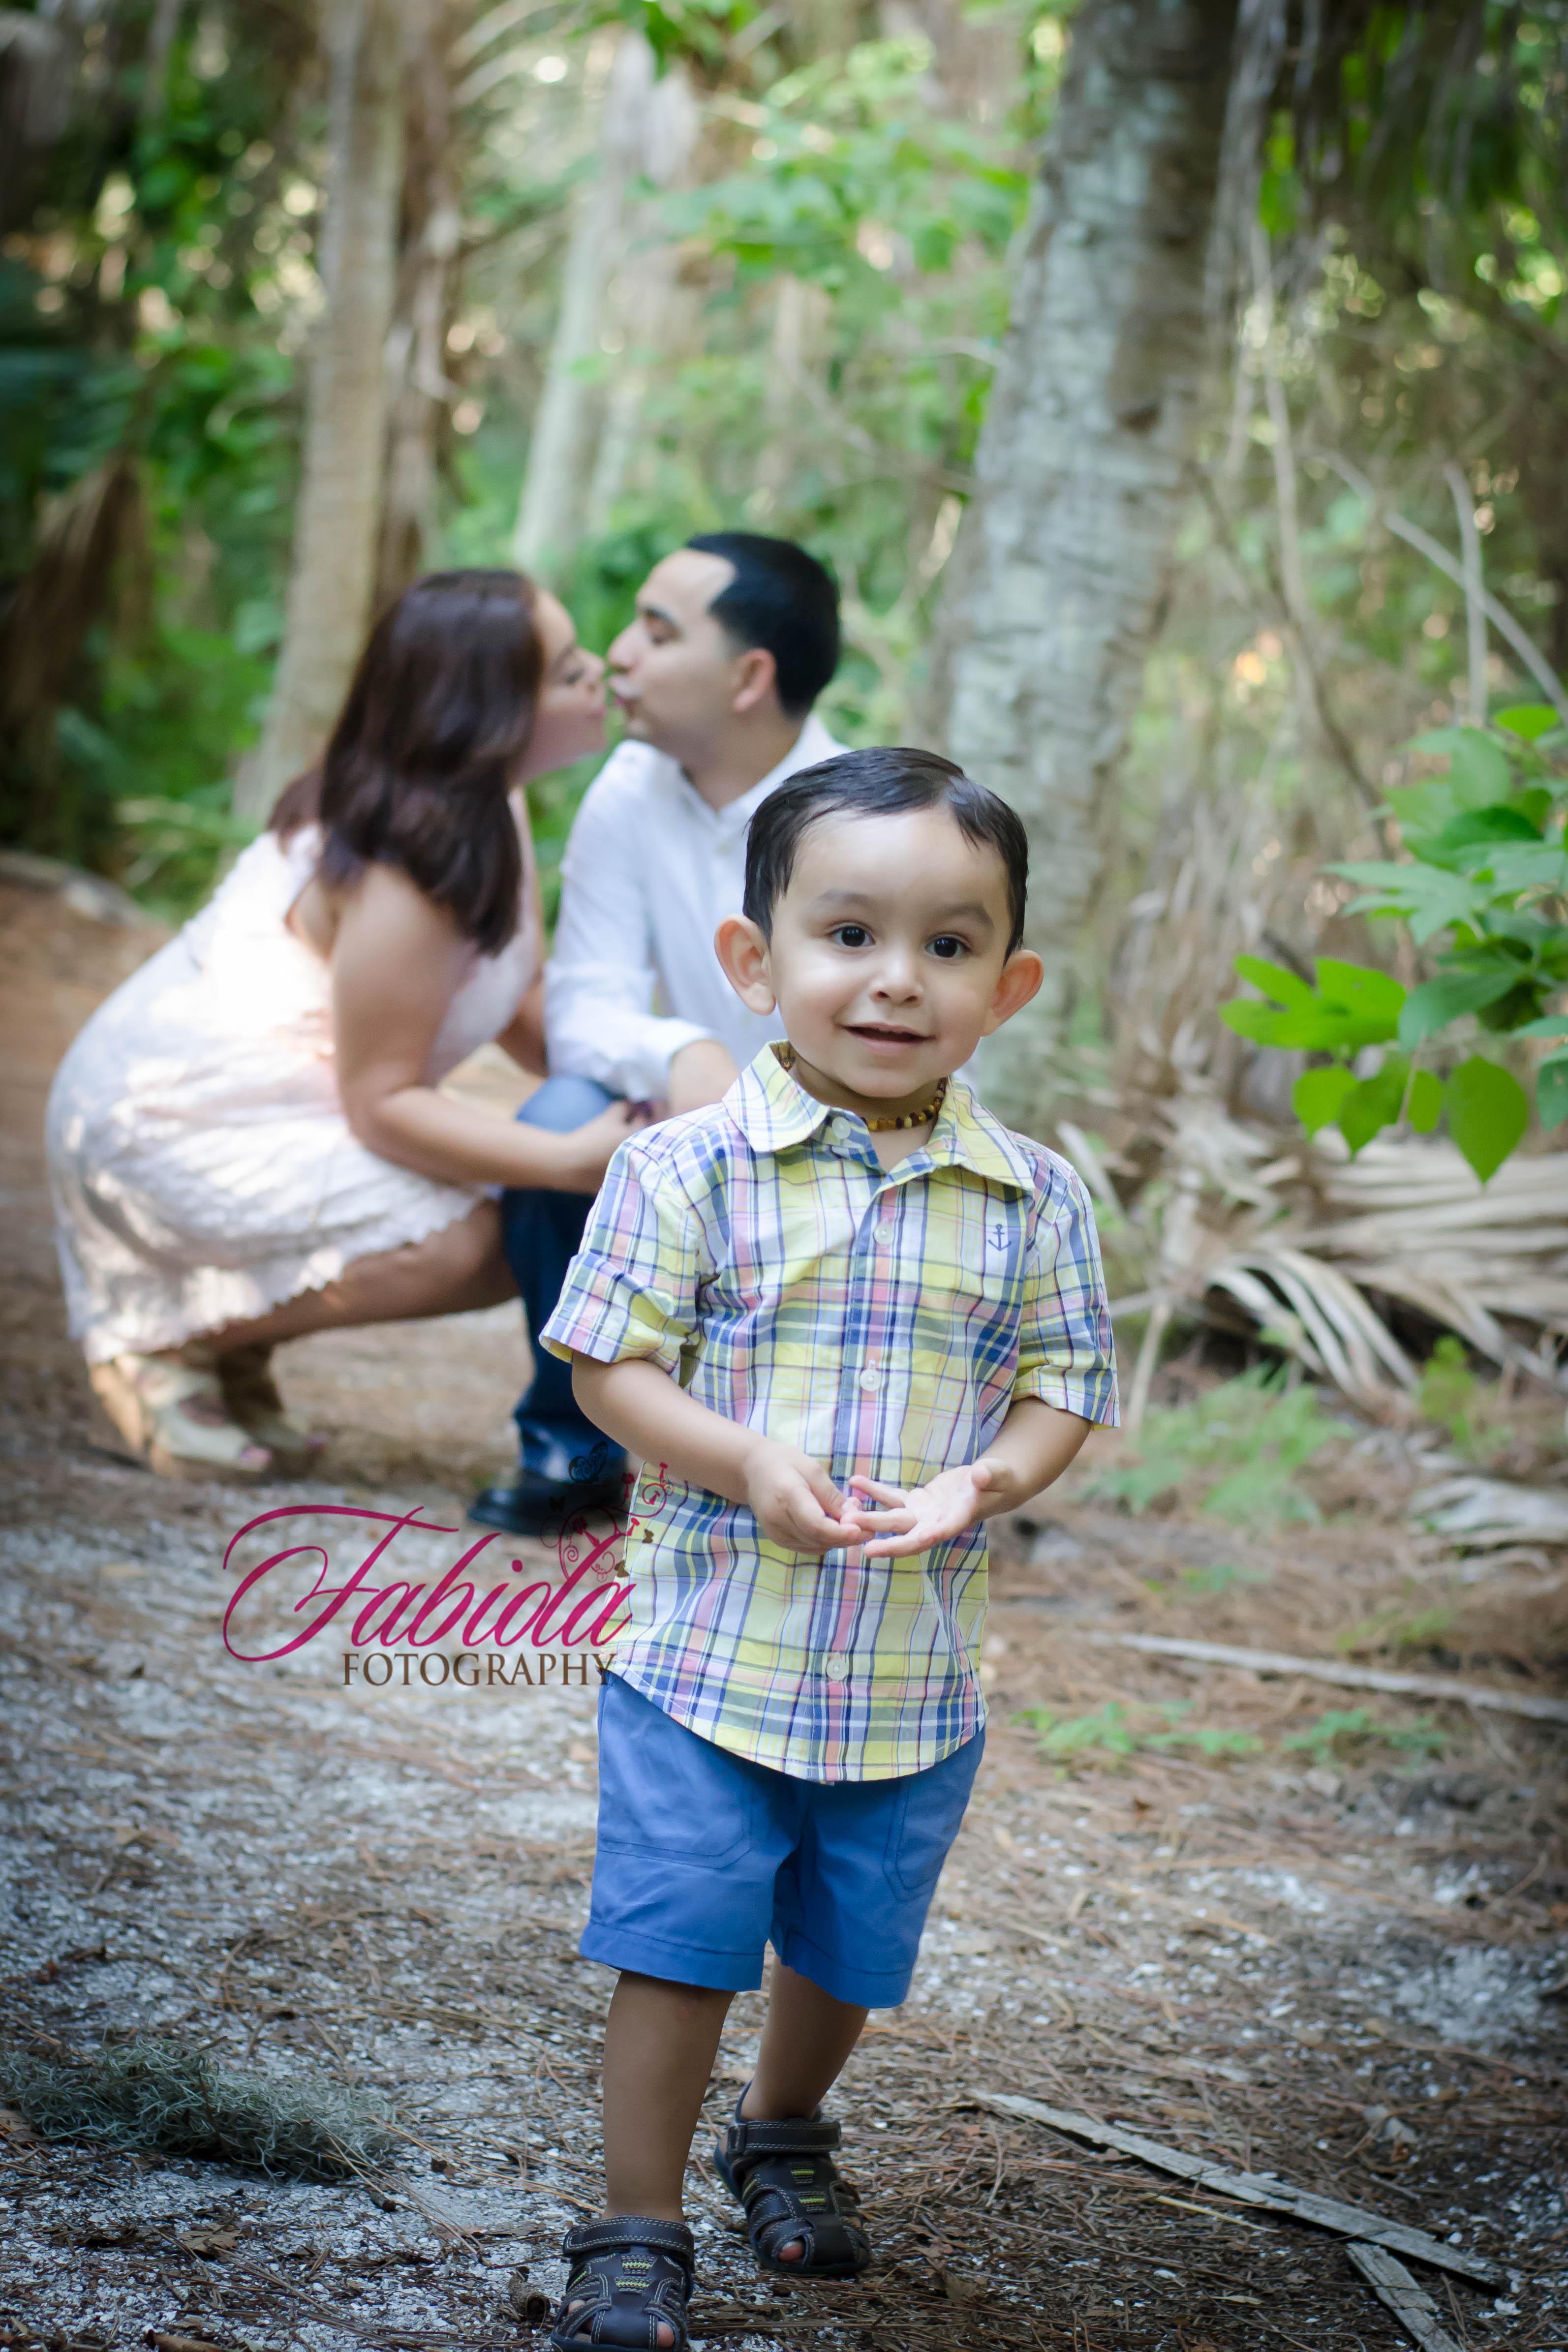 Fabiola Fotography image 30